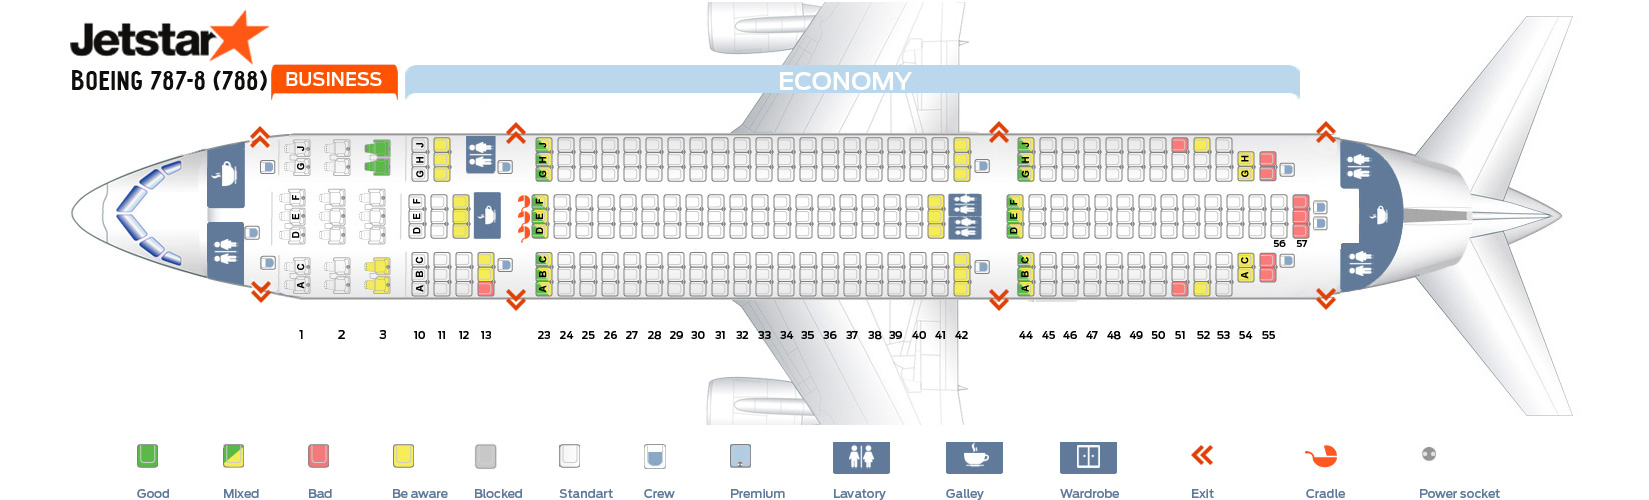 Seat Map Boeing 787-8 Jetstar Airlines